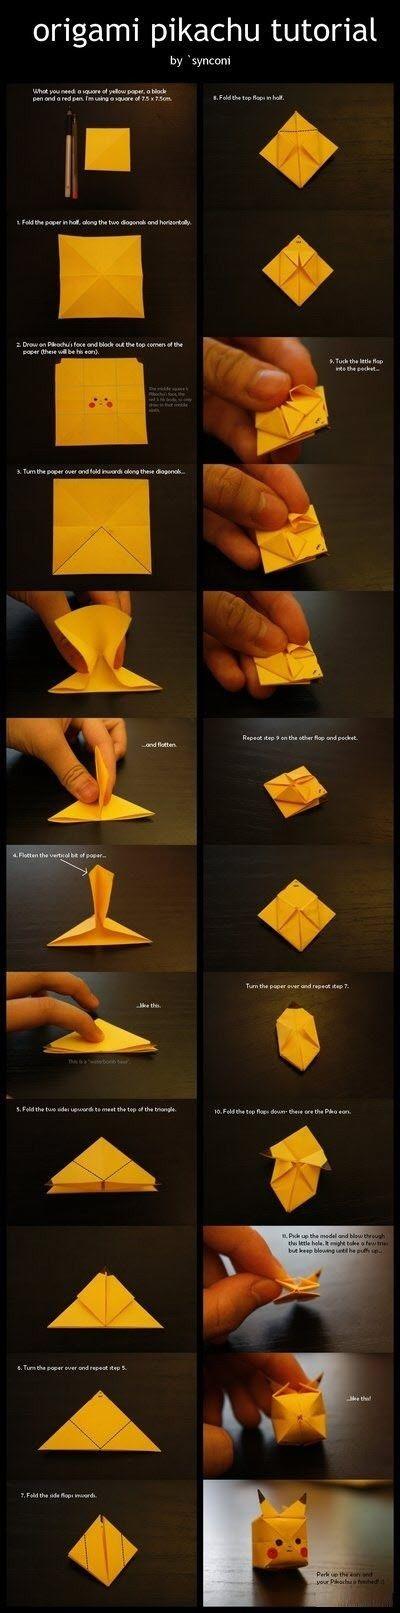 DIY – Origami Pikachu http://vur.me/tbw/Paper-Airplane-Instructions/